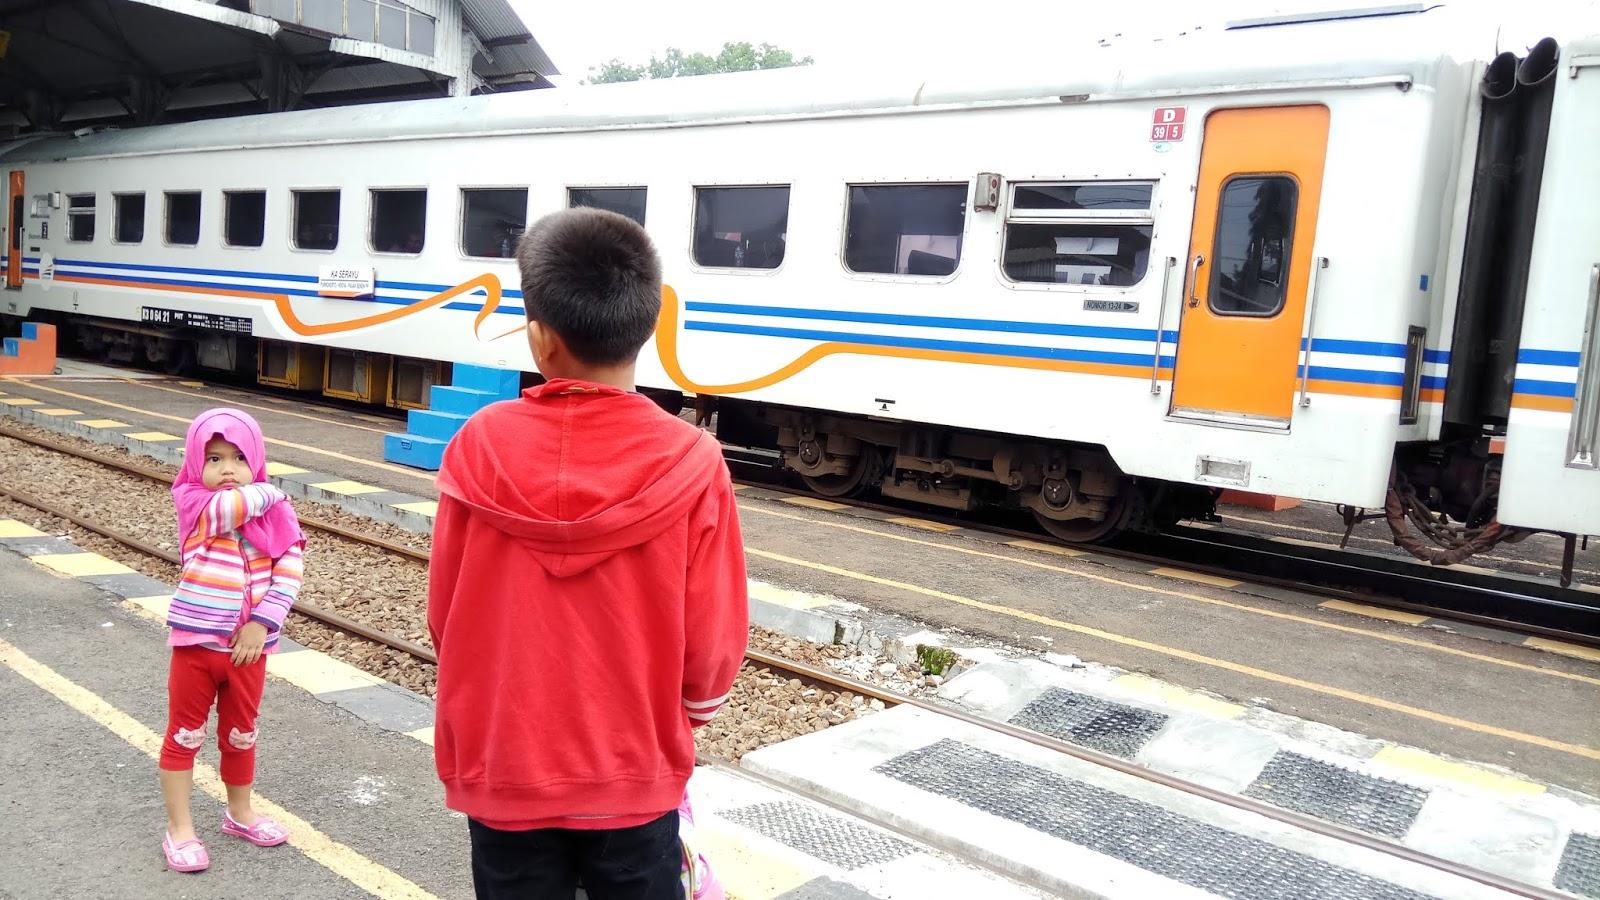 Astin Astanti: Membeli Tiket Kereta Api Serayu Melalui Traveloka